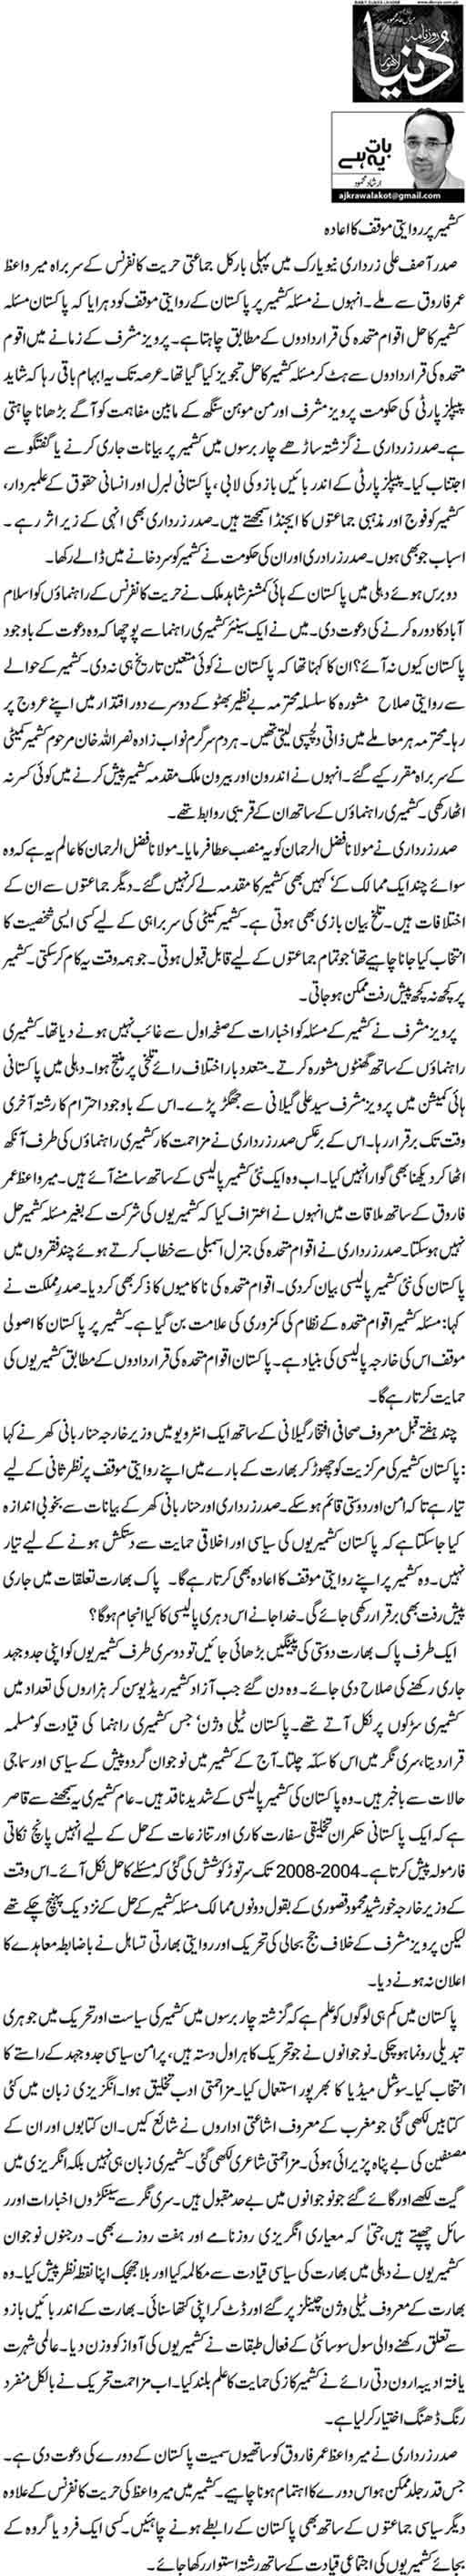 Kashmir par riwayti muaqqaf ka aiada - Irshad Mehmood